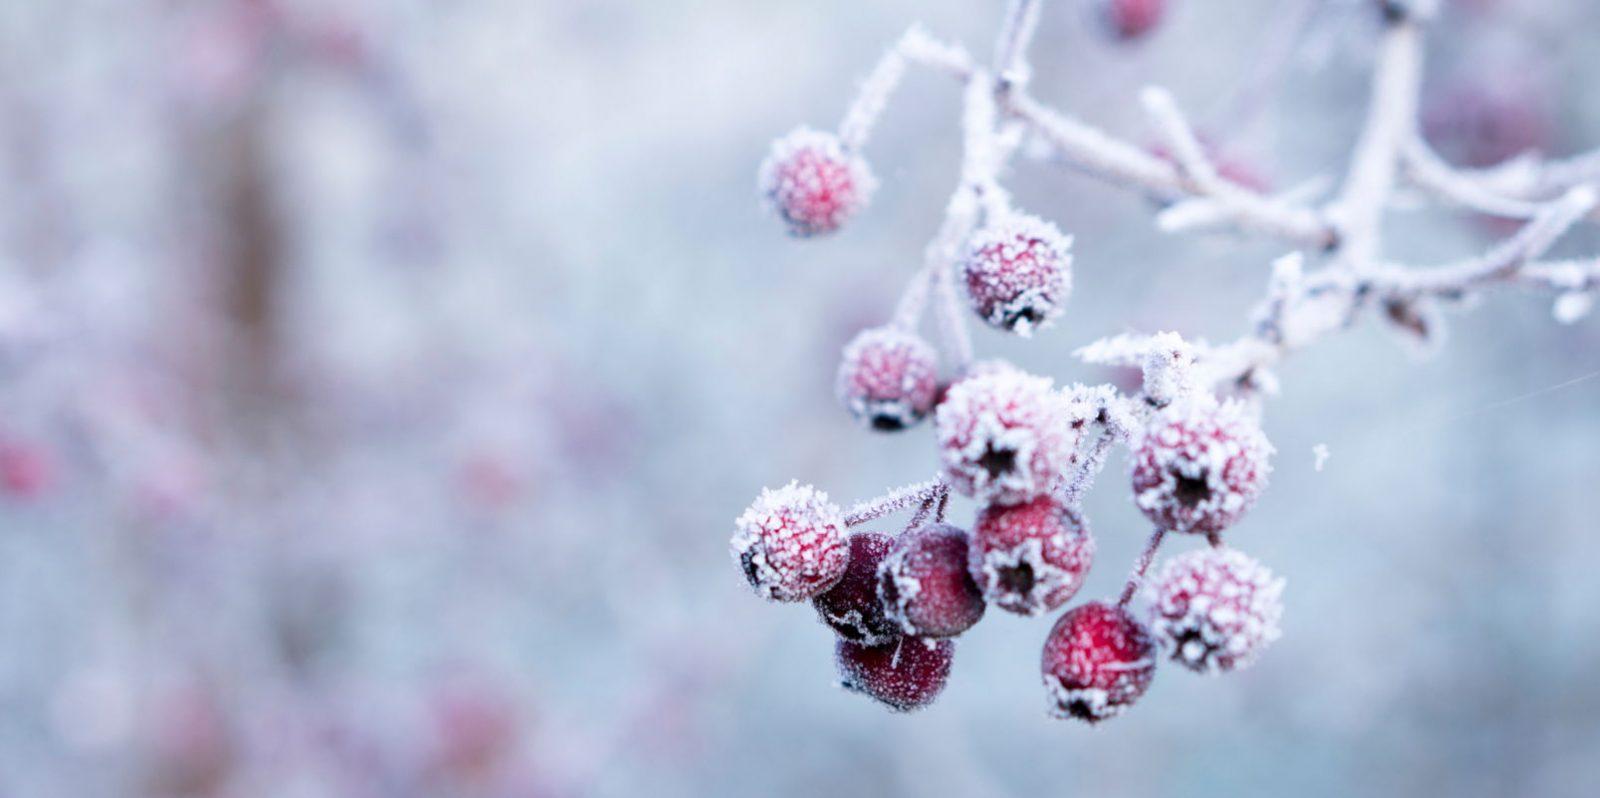 Winter background Tumblr - weblium